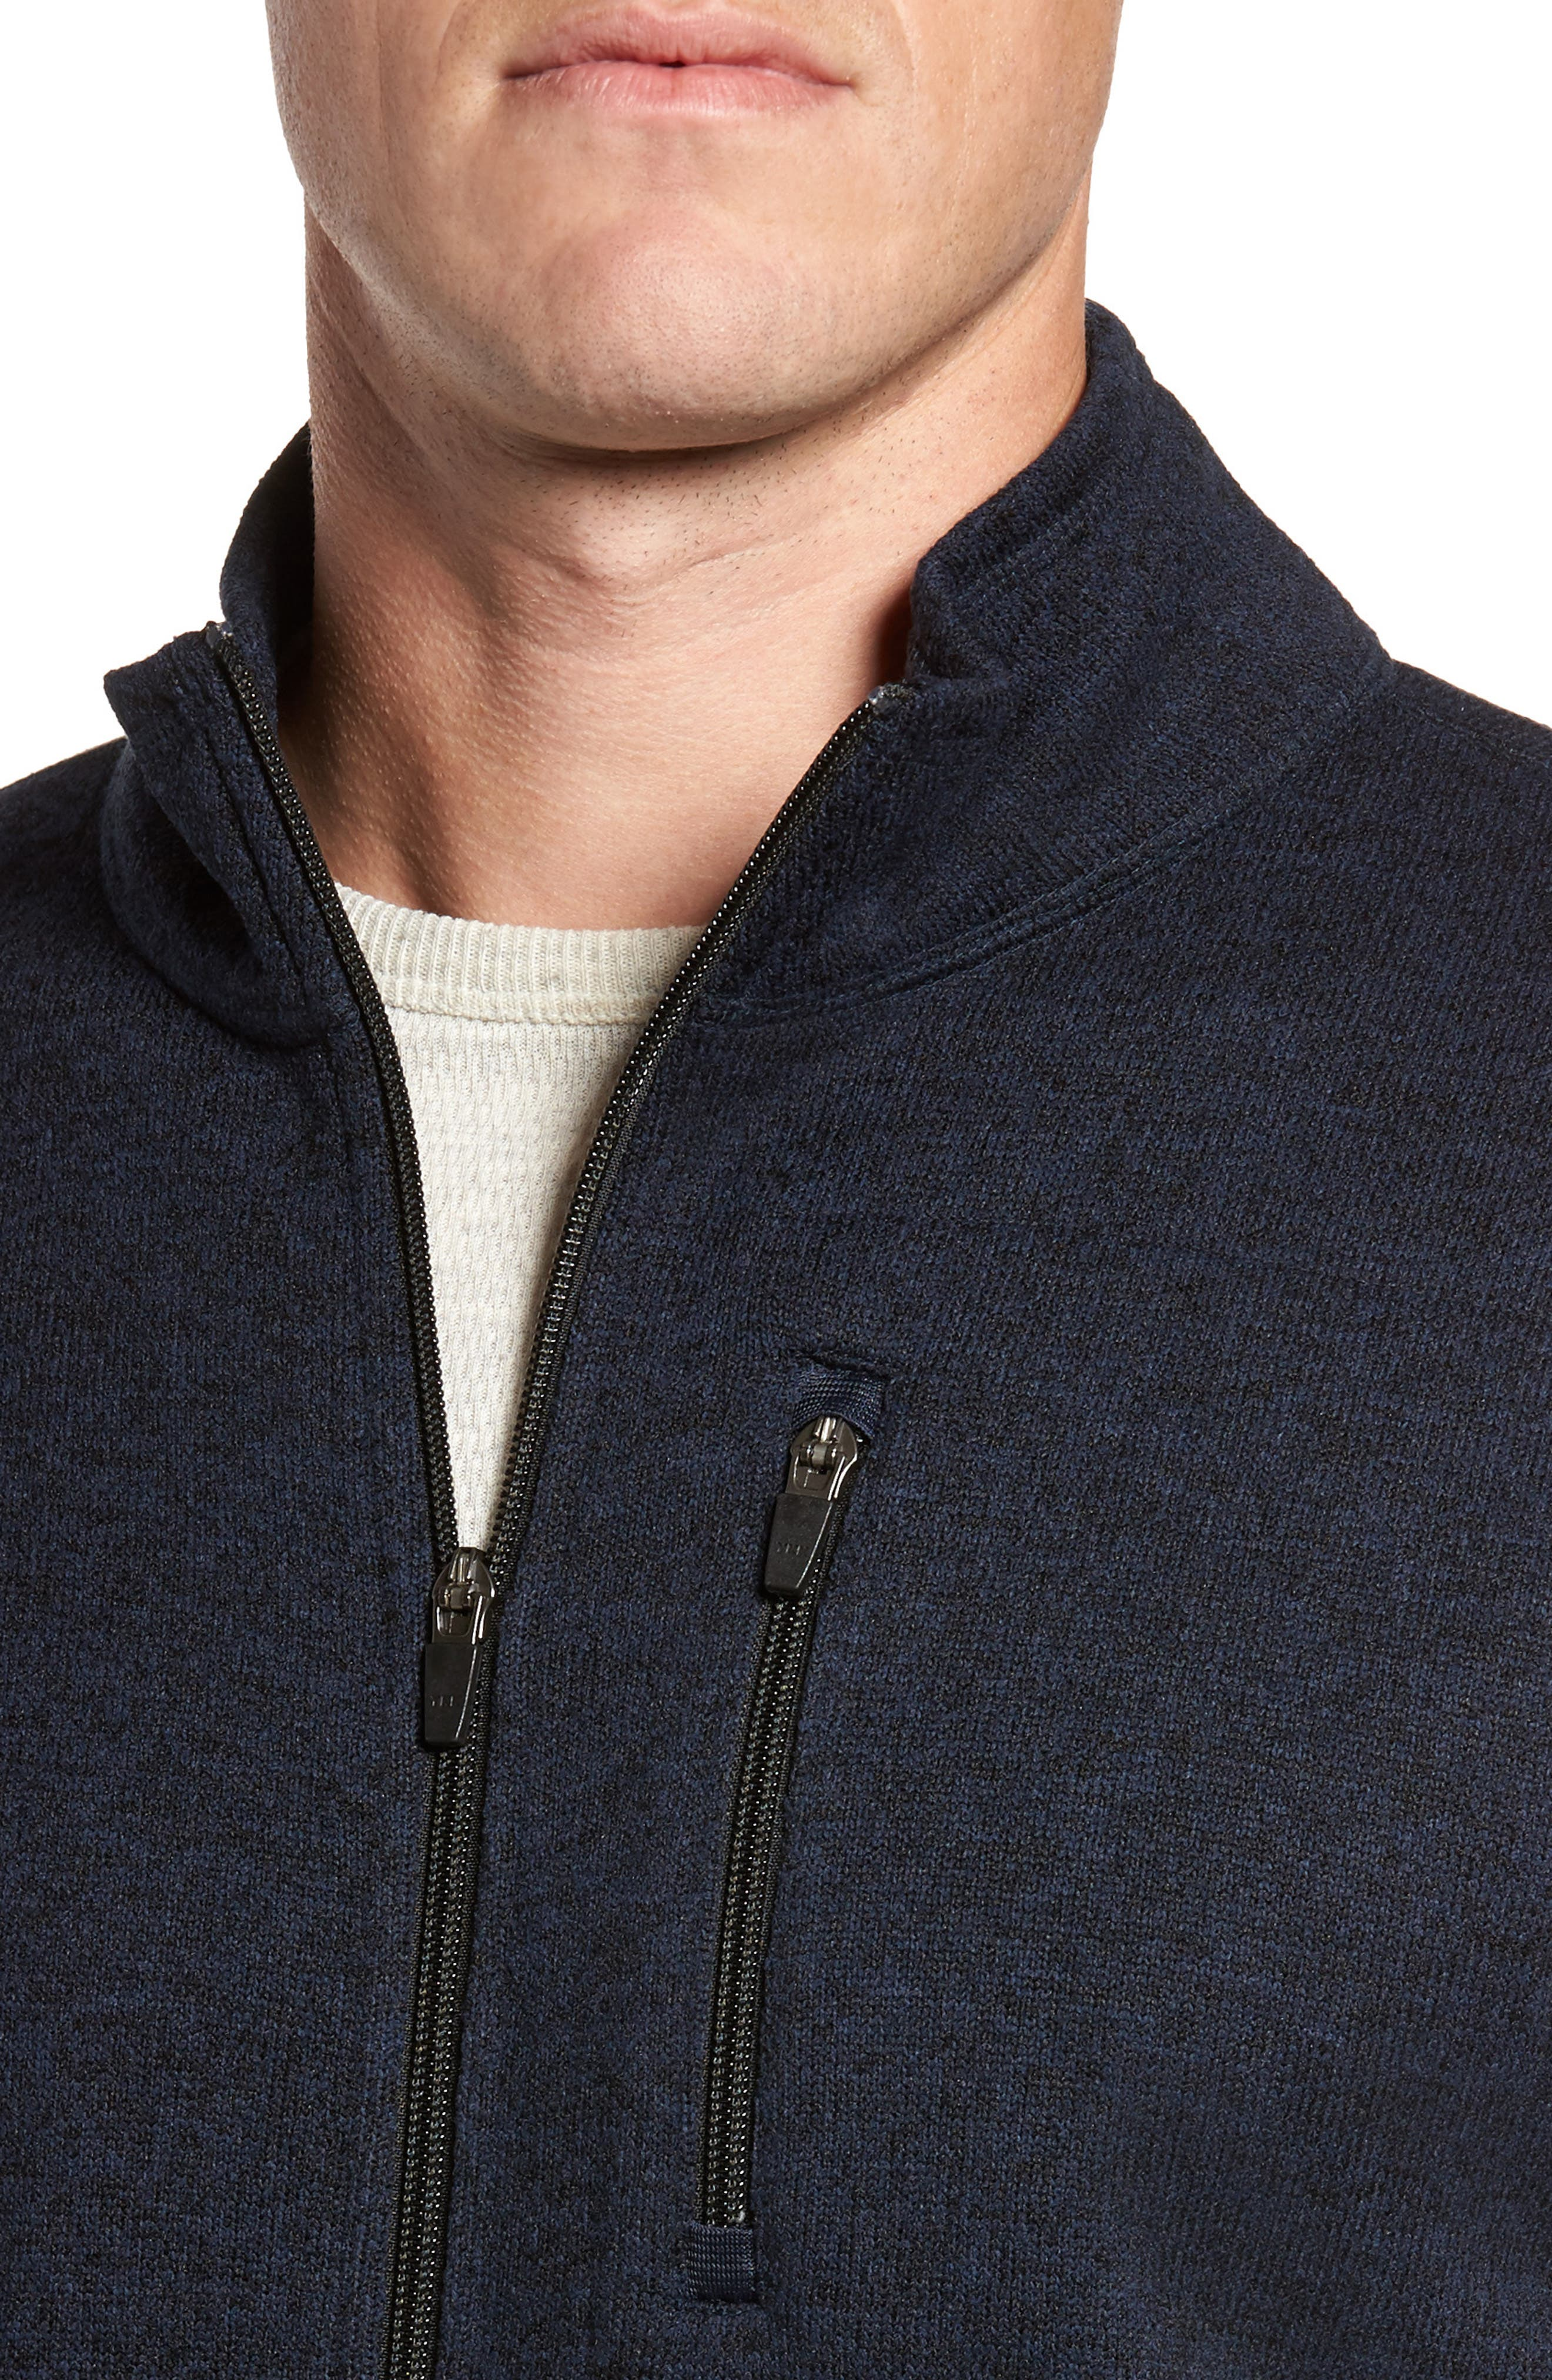 Sweater Knit Fleece Zip Front Jacket,                             Alternate thumbnail 12, color,